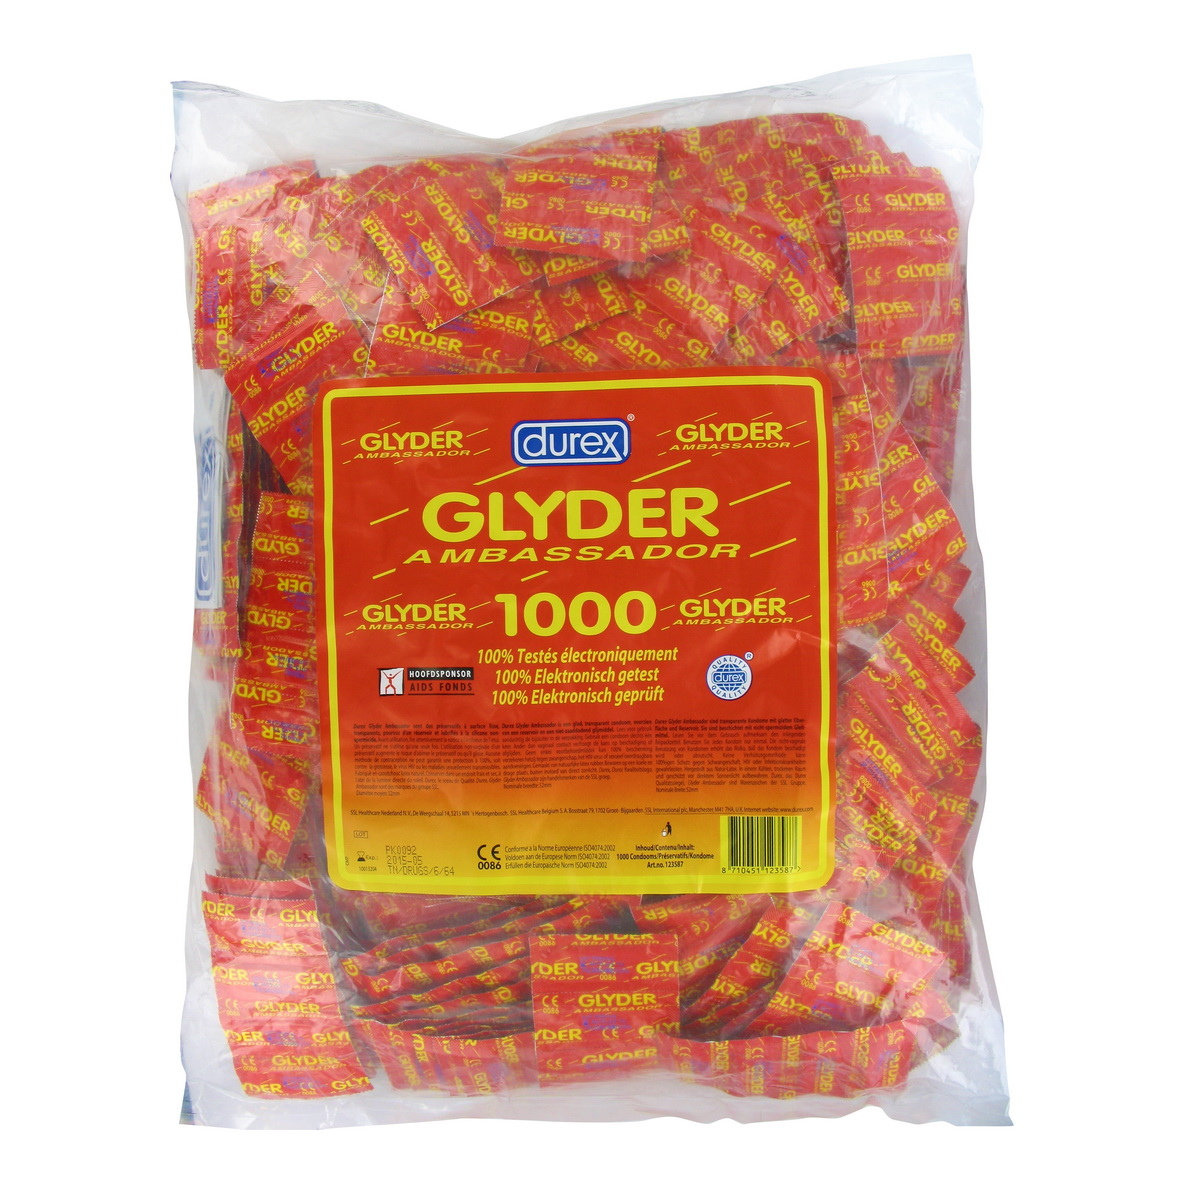 Kondomy Durex Glyder Ambassador (1000 ks)